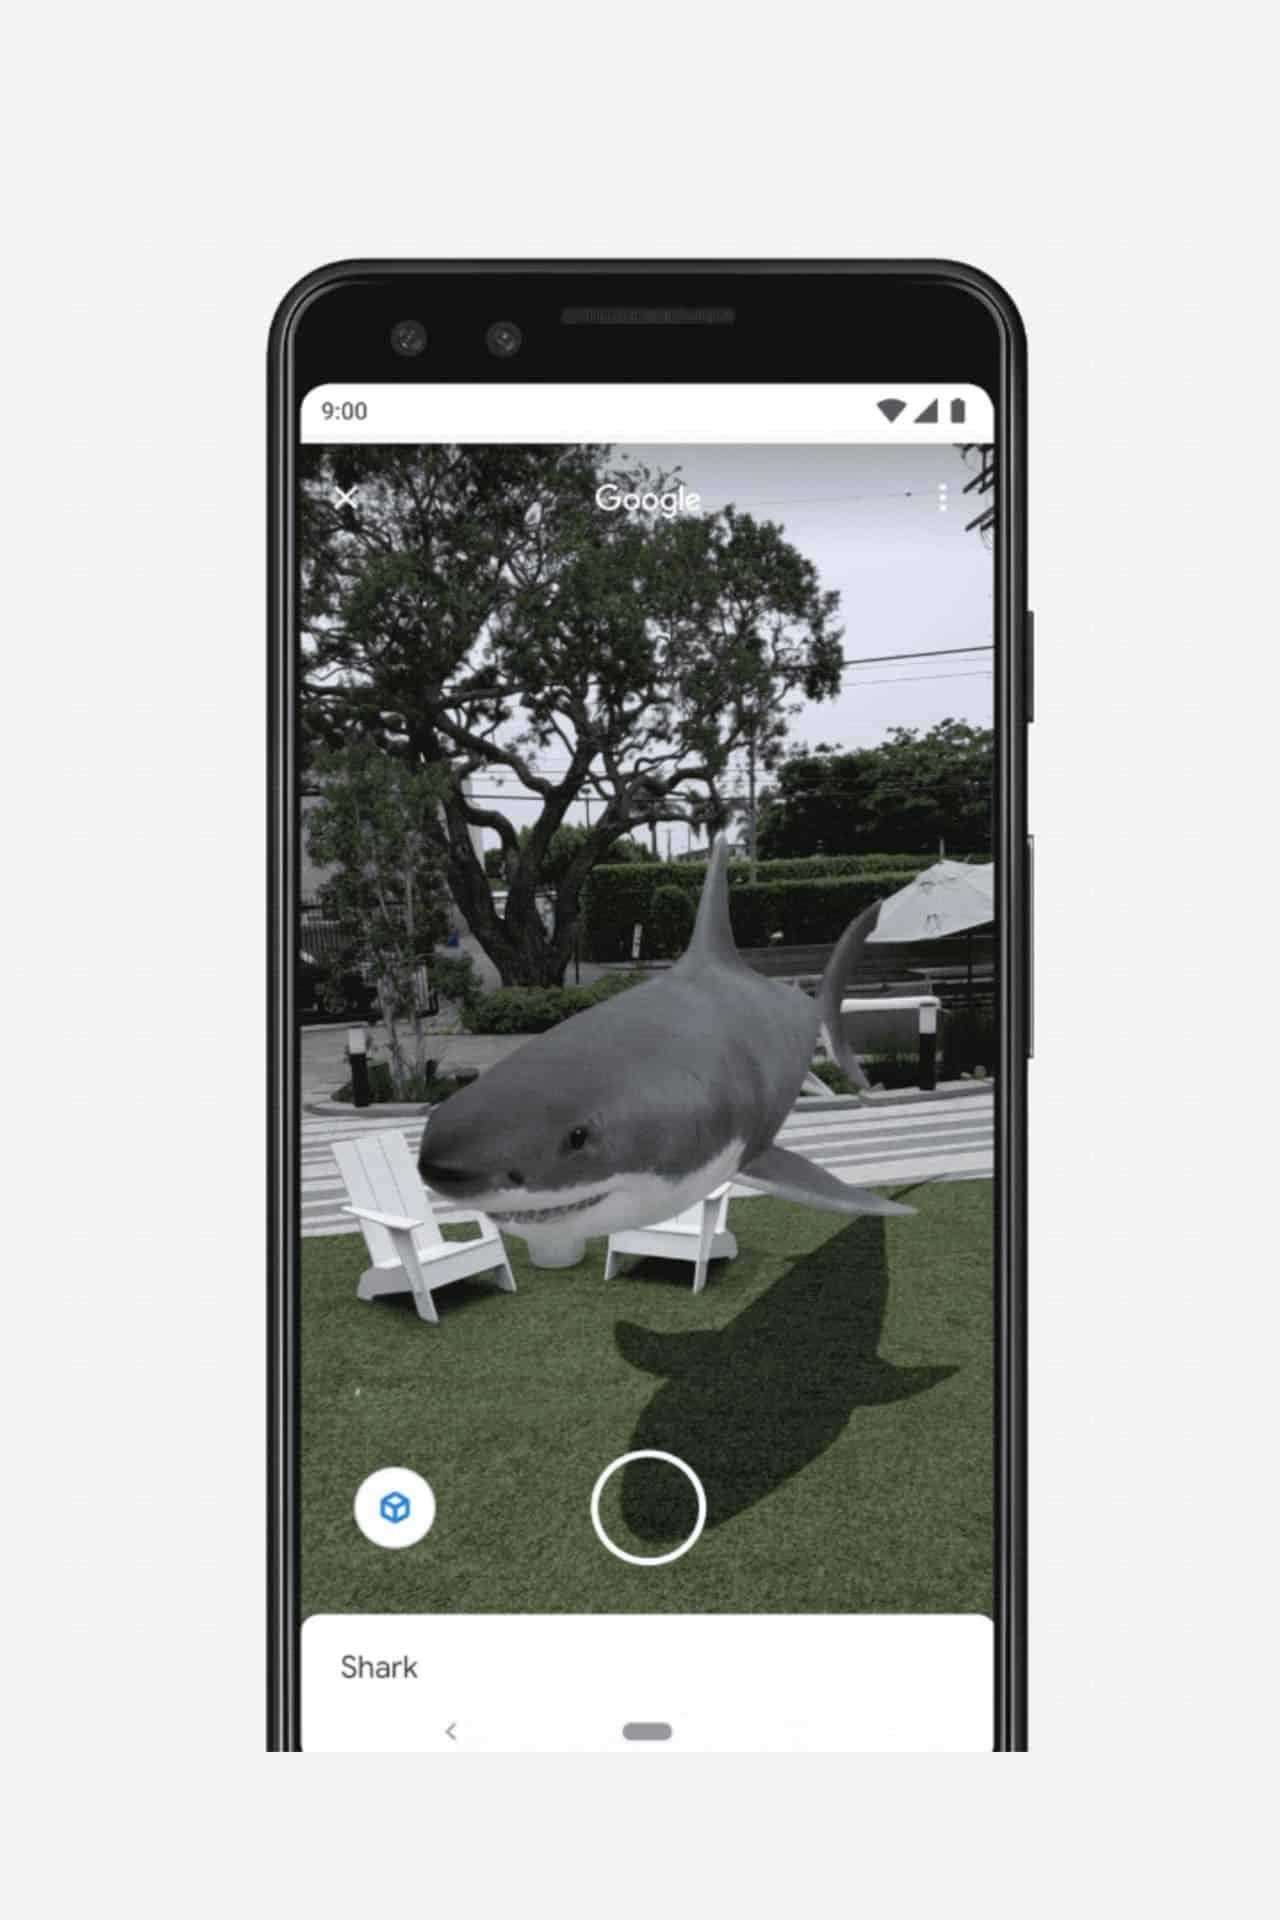 Realta aumentata SERP Google